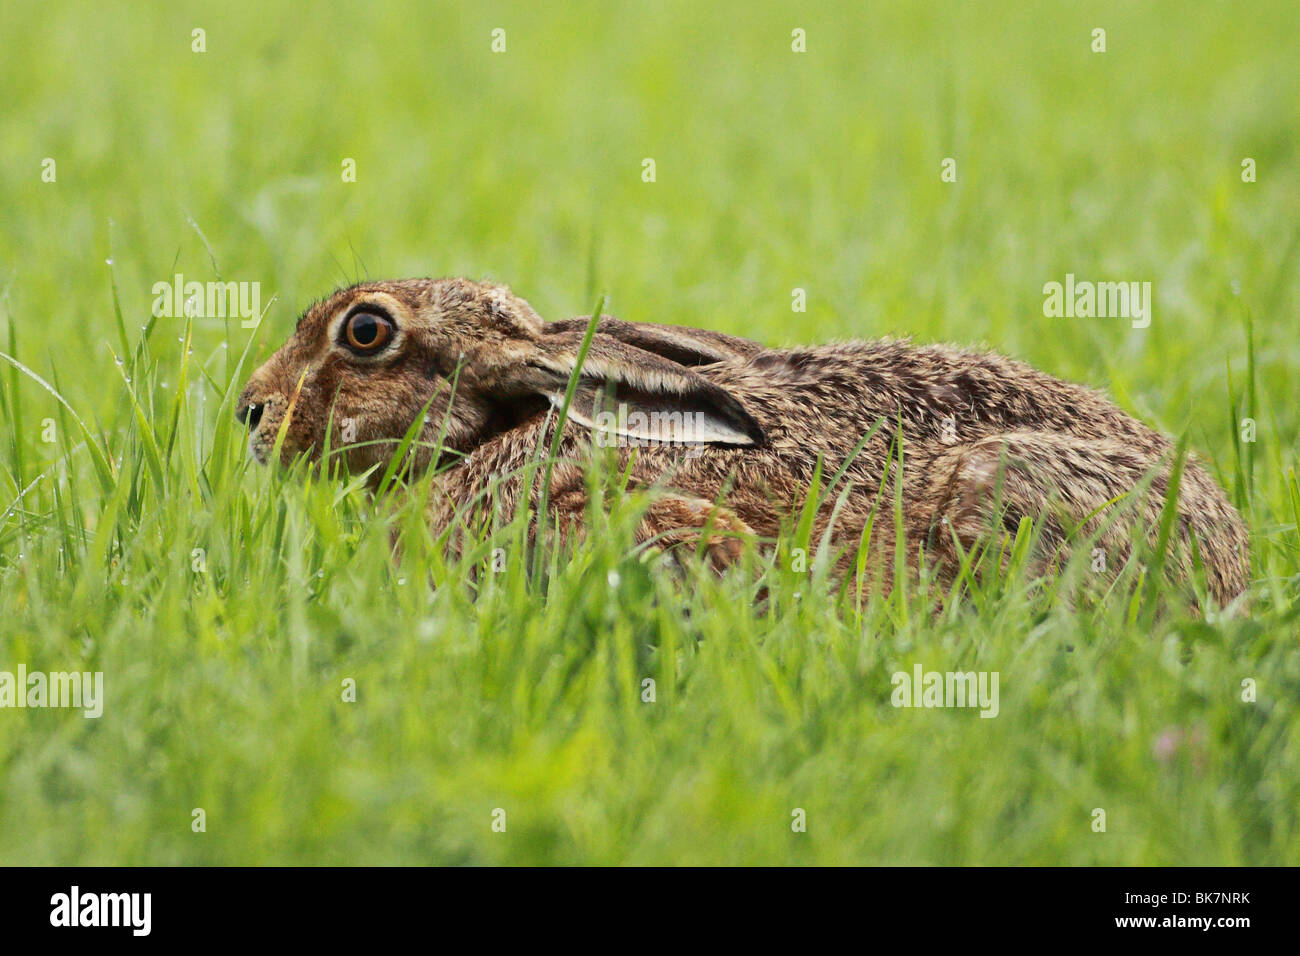 european brown hare - Stock Image